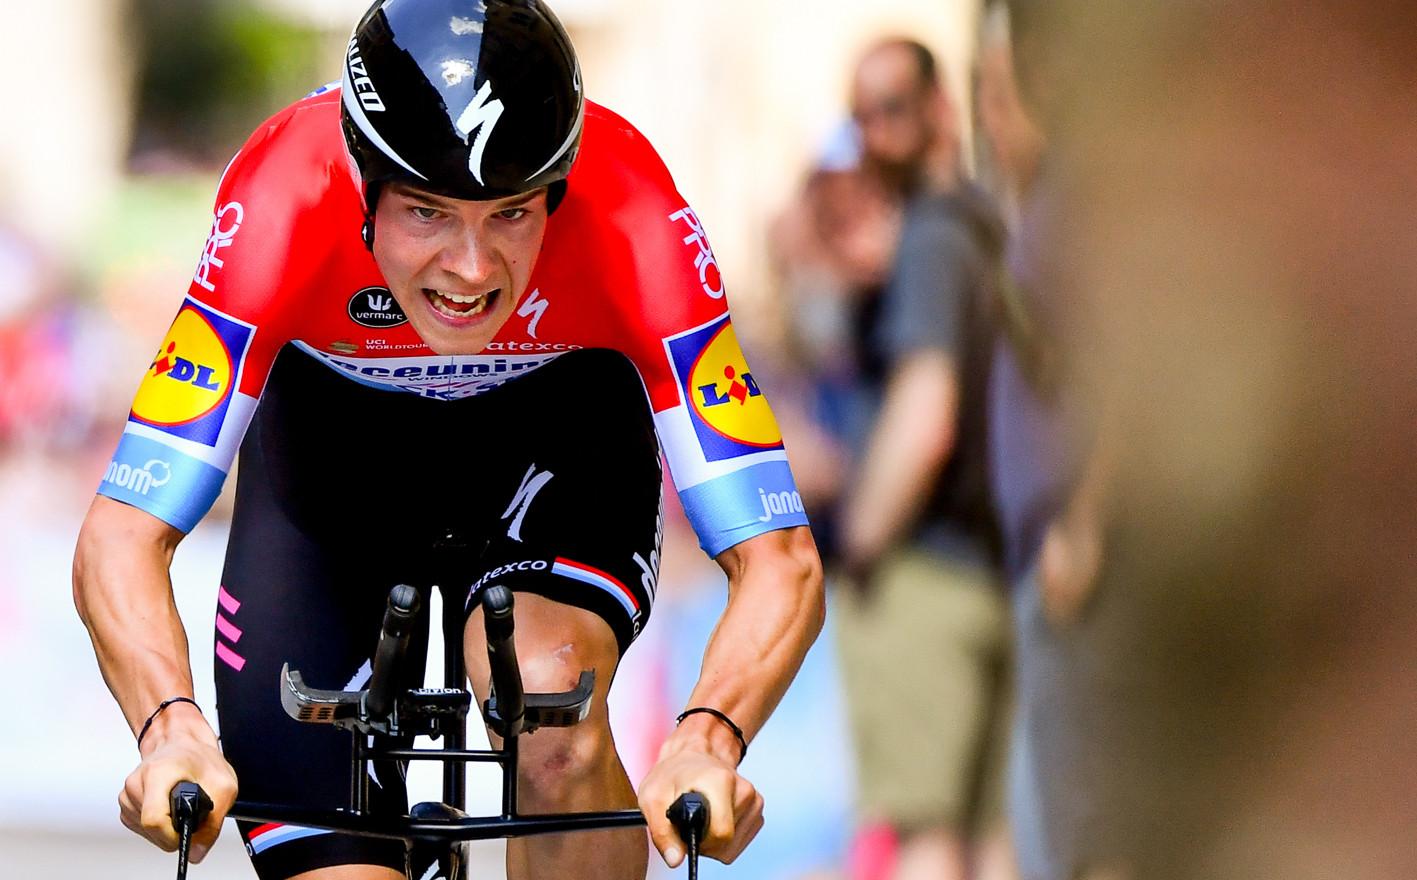 Bob Jungels (L/Deceuninck) at the final timetrial of the Giro 2019.